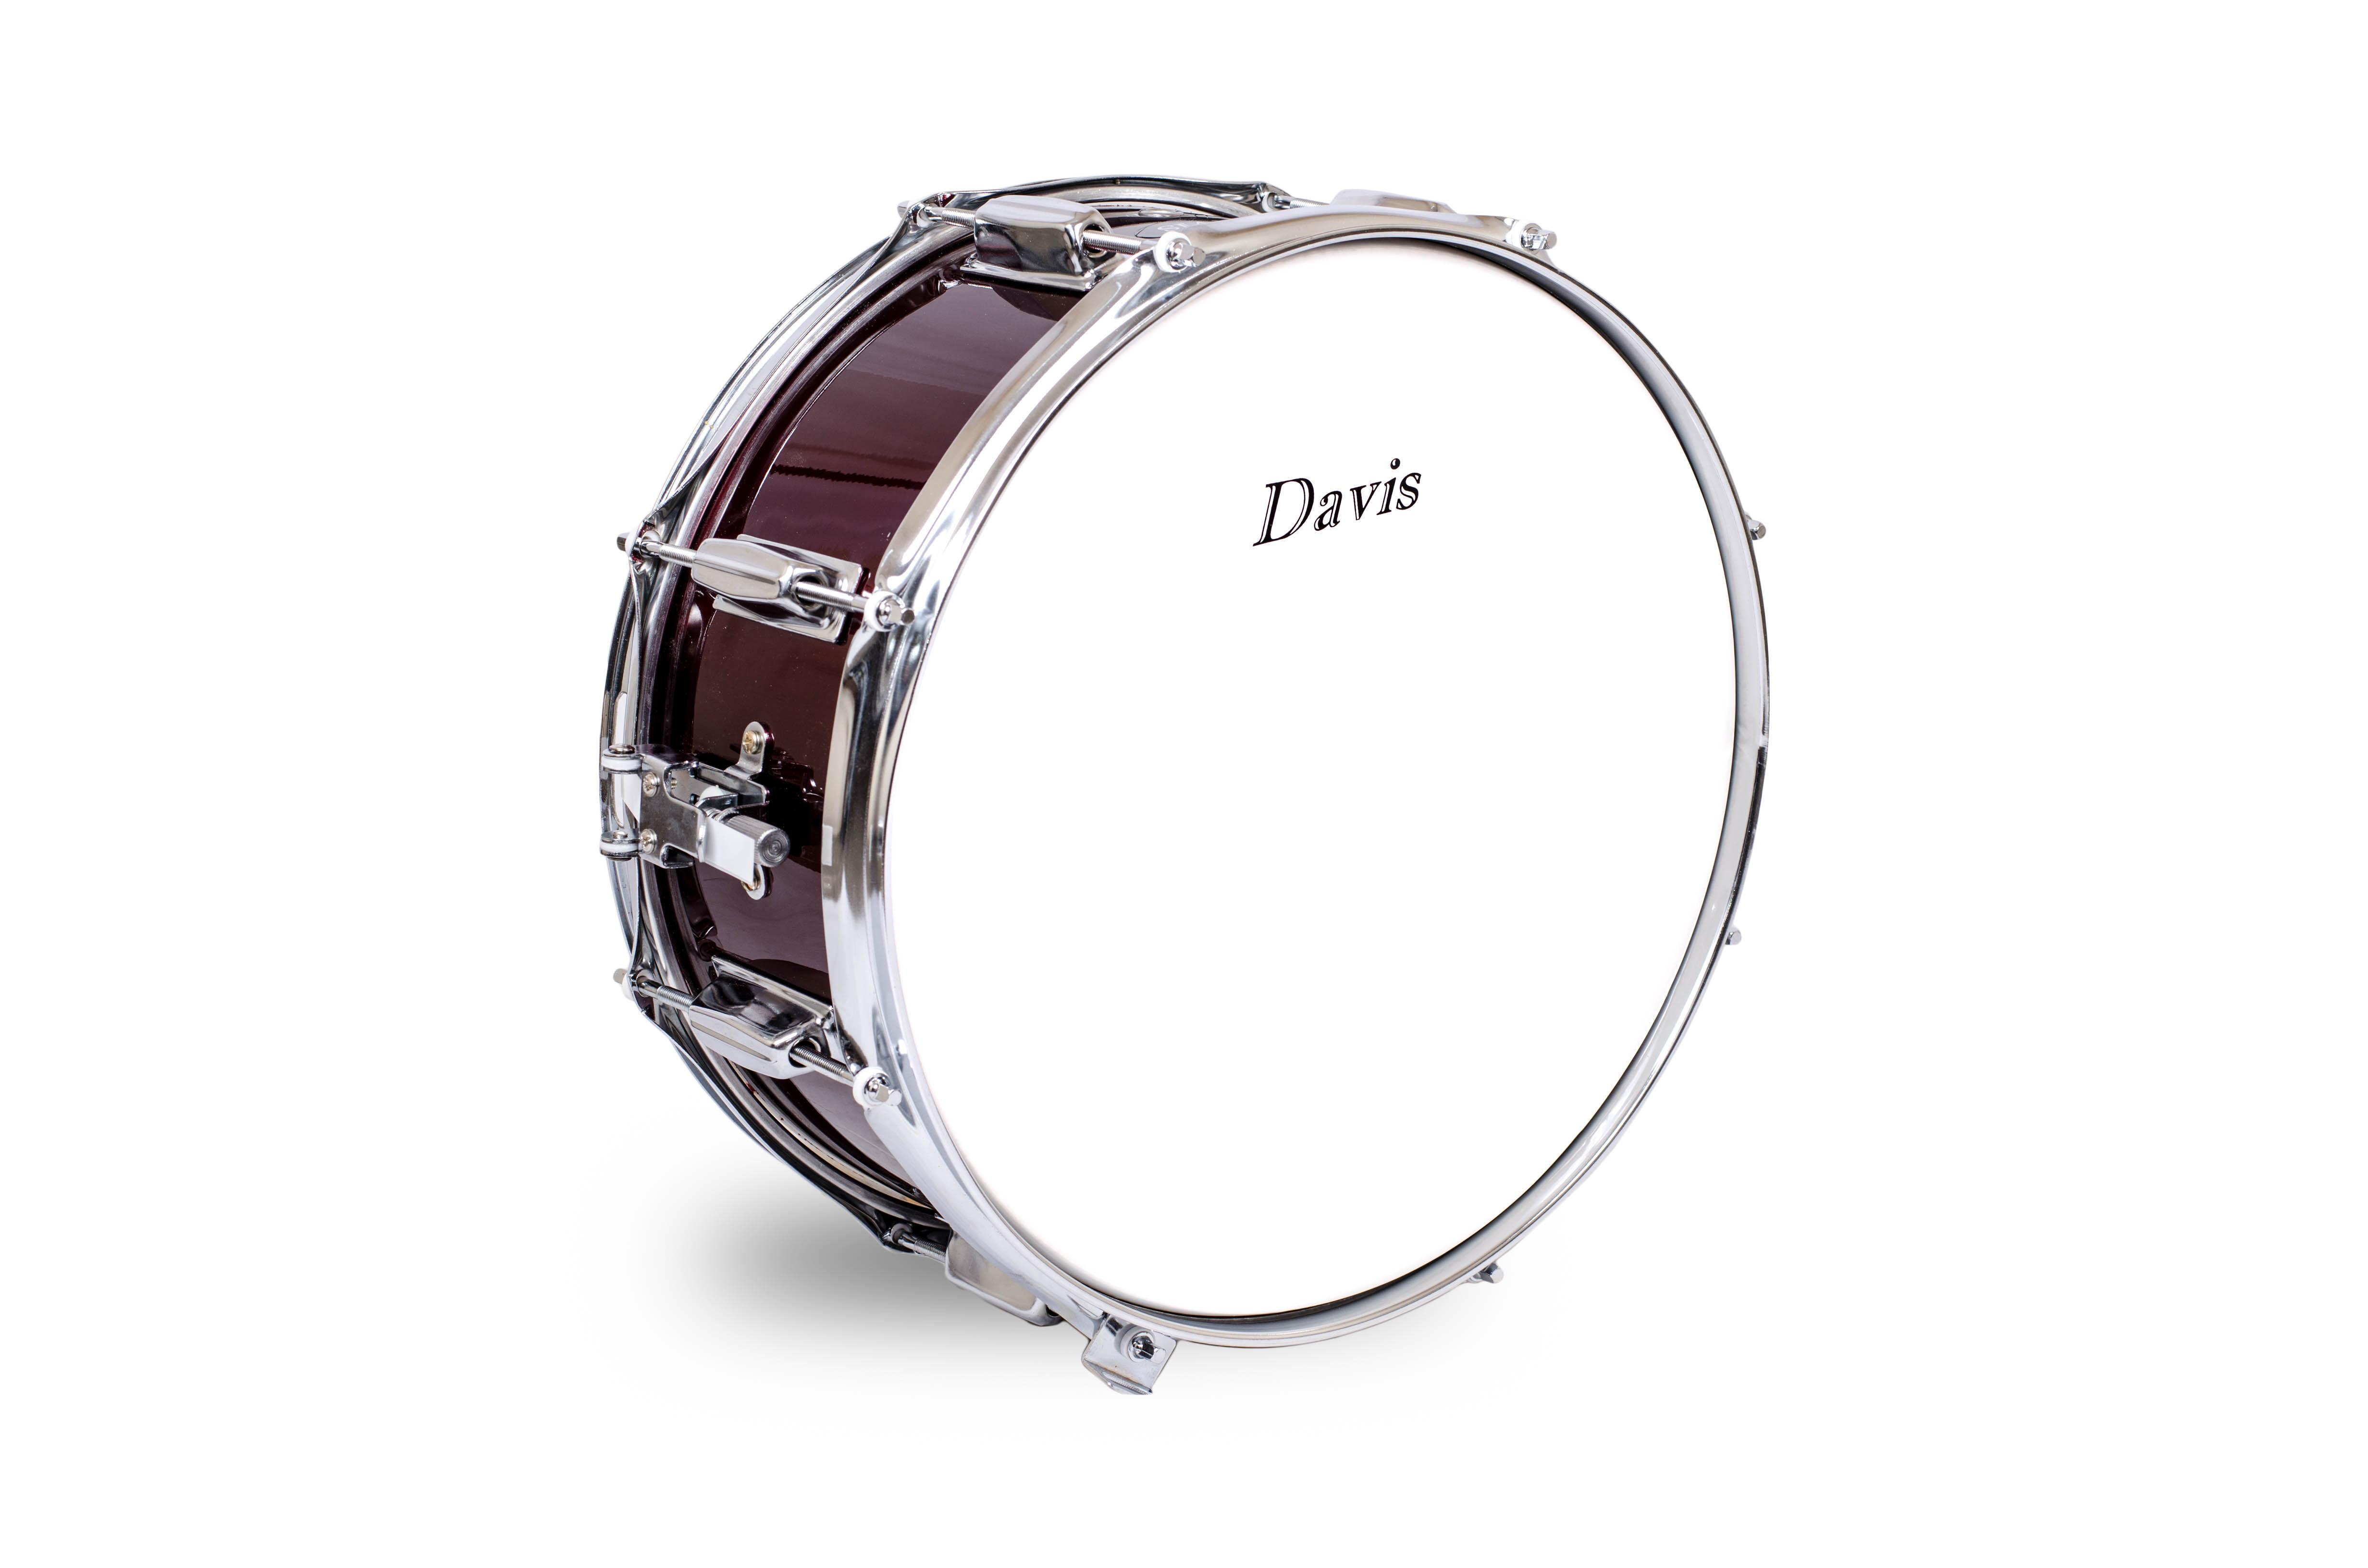 Davis Musical Instruments- snr1455_0